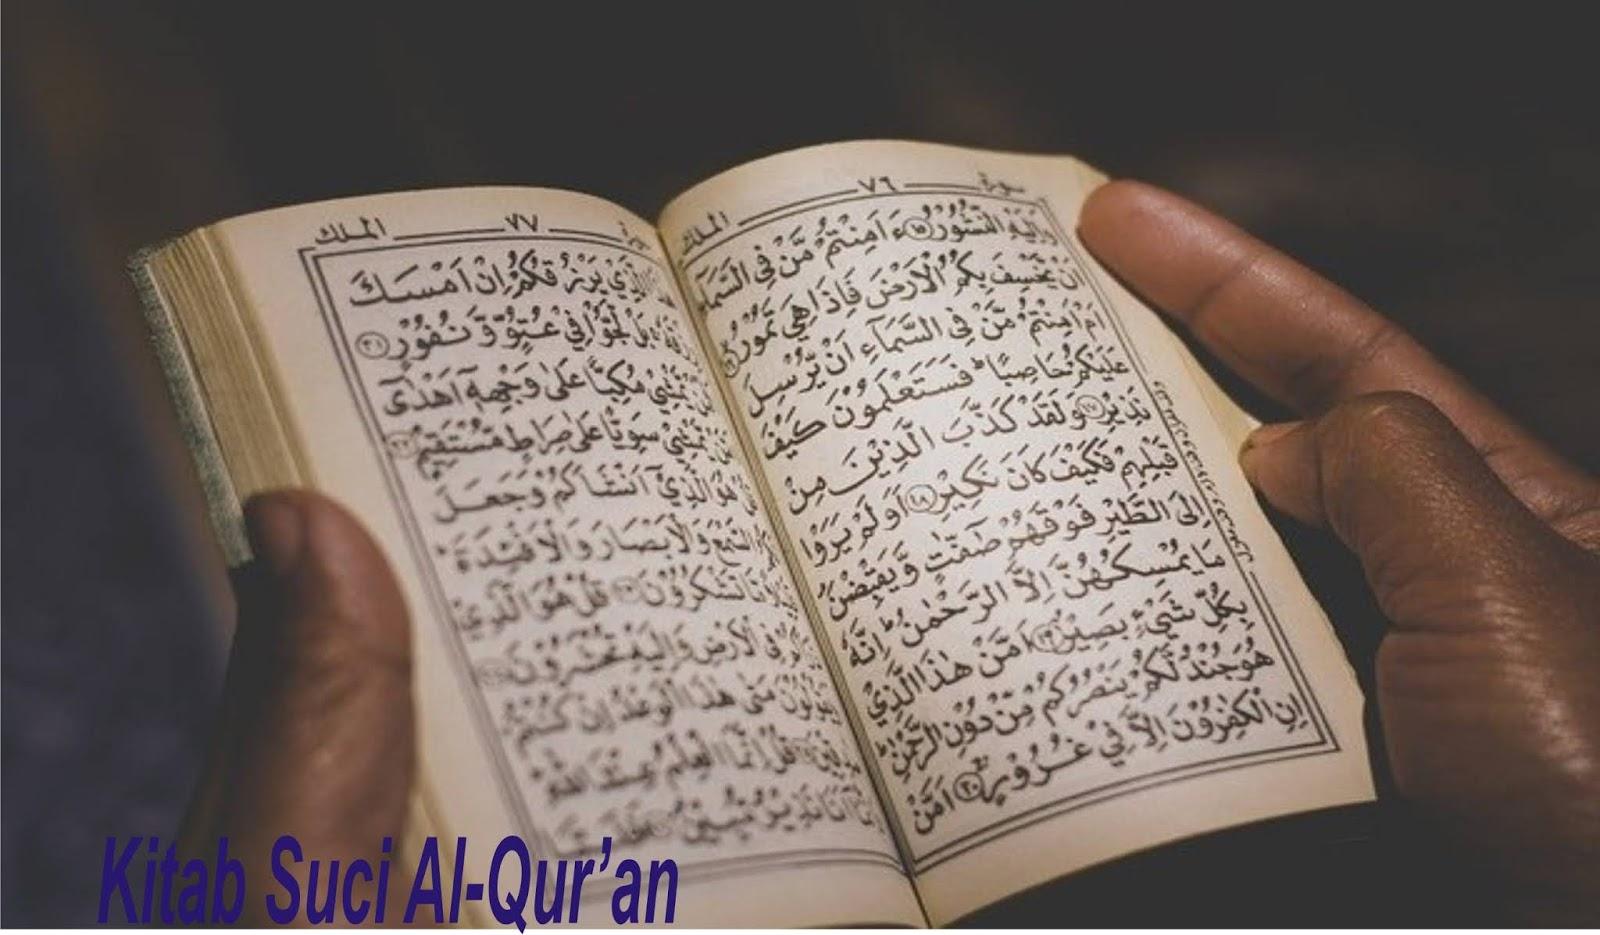 kitab suci al-quran